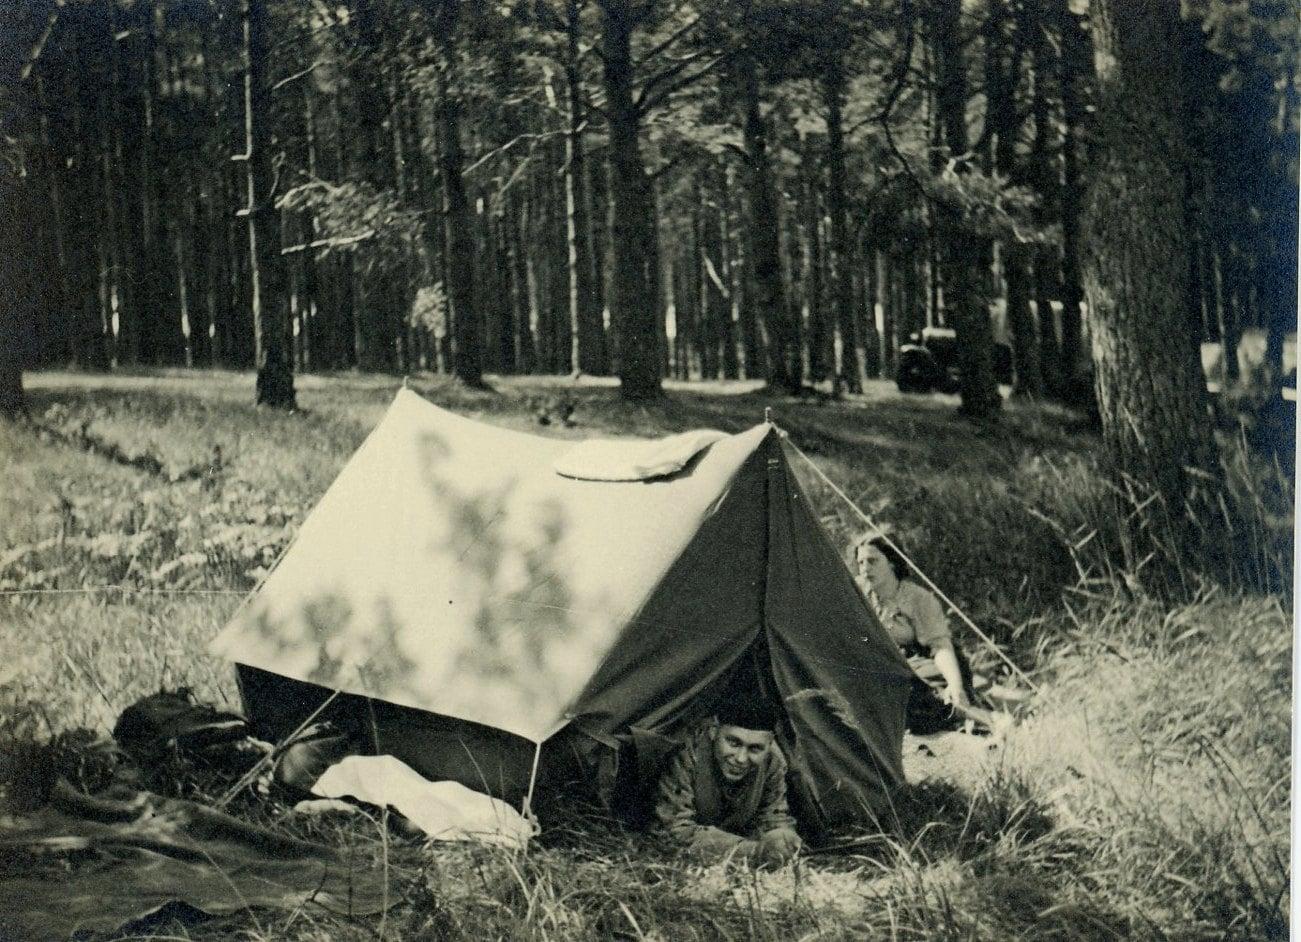 Vintage Camping Photos 115